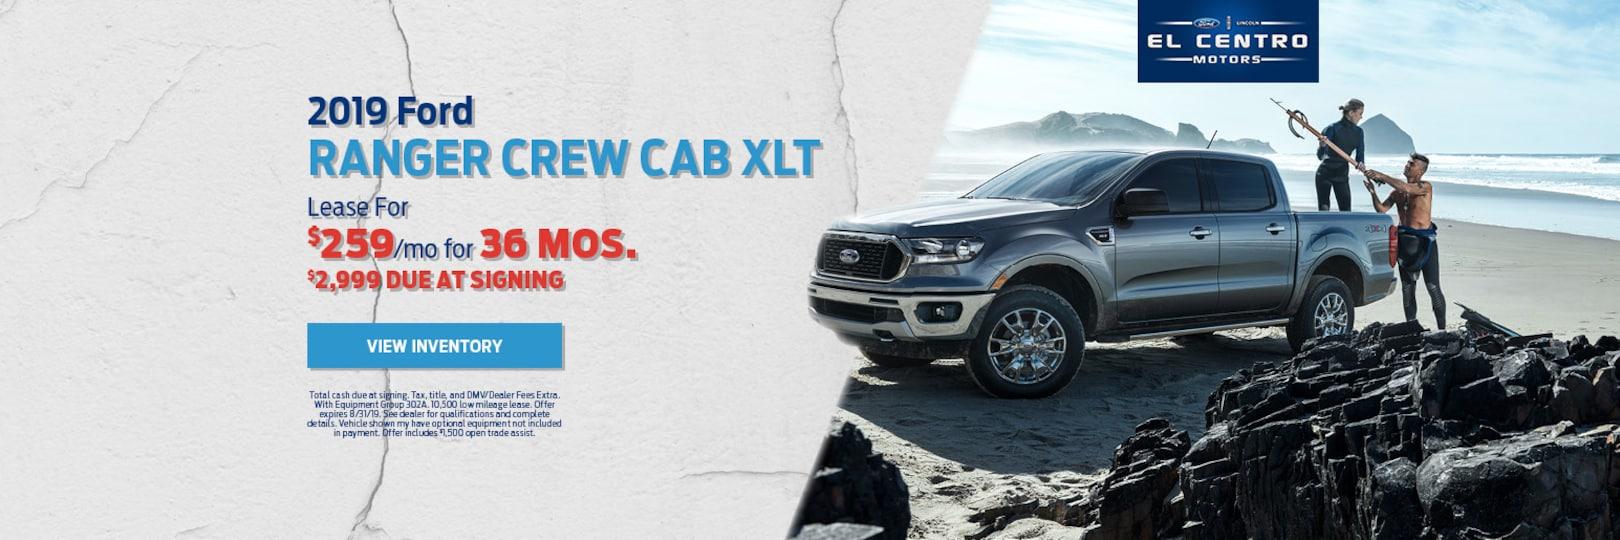 El Centro Motors >> El Centro Motors 2020 Upcoming Car Release